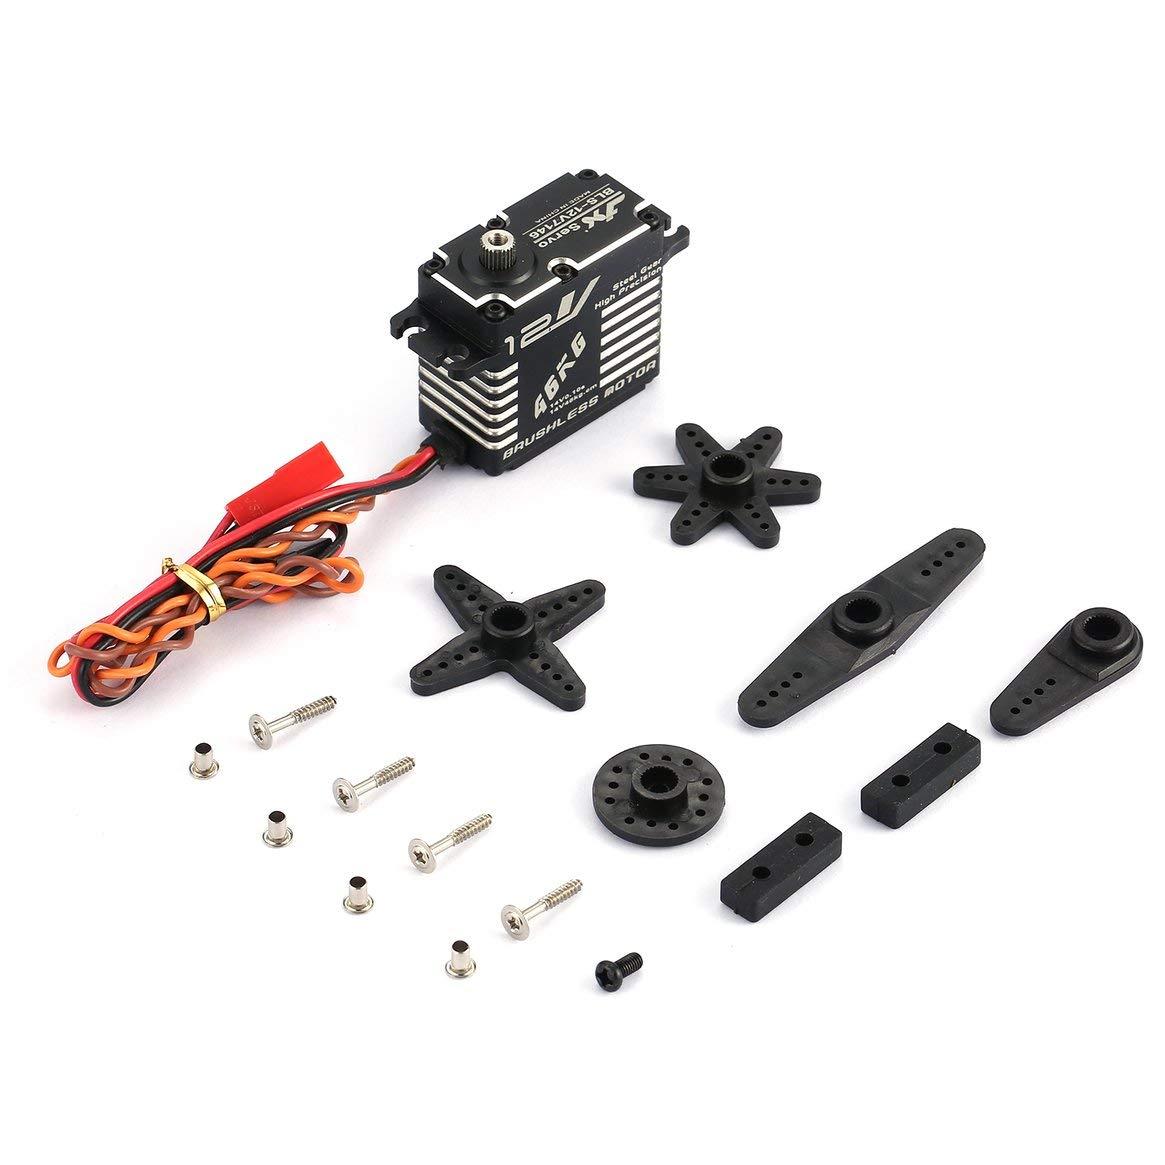 JX BLS-12V7146 Metall Universal Digital Servo mit 47 kg Hohe Drehmoment für RC Auto Roboter Flugzeug Starrflügel Flugzeug Drone